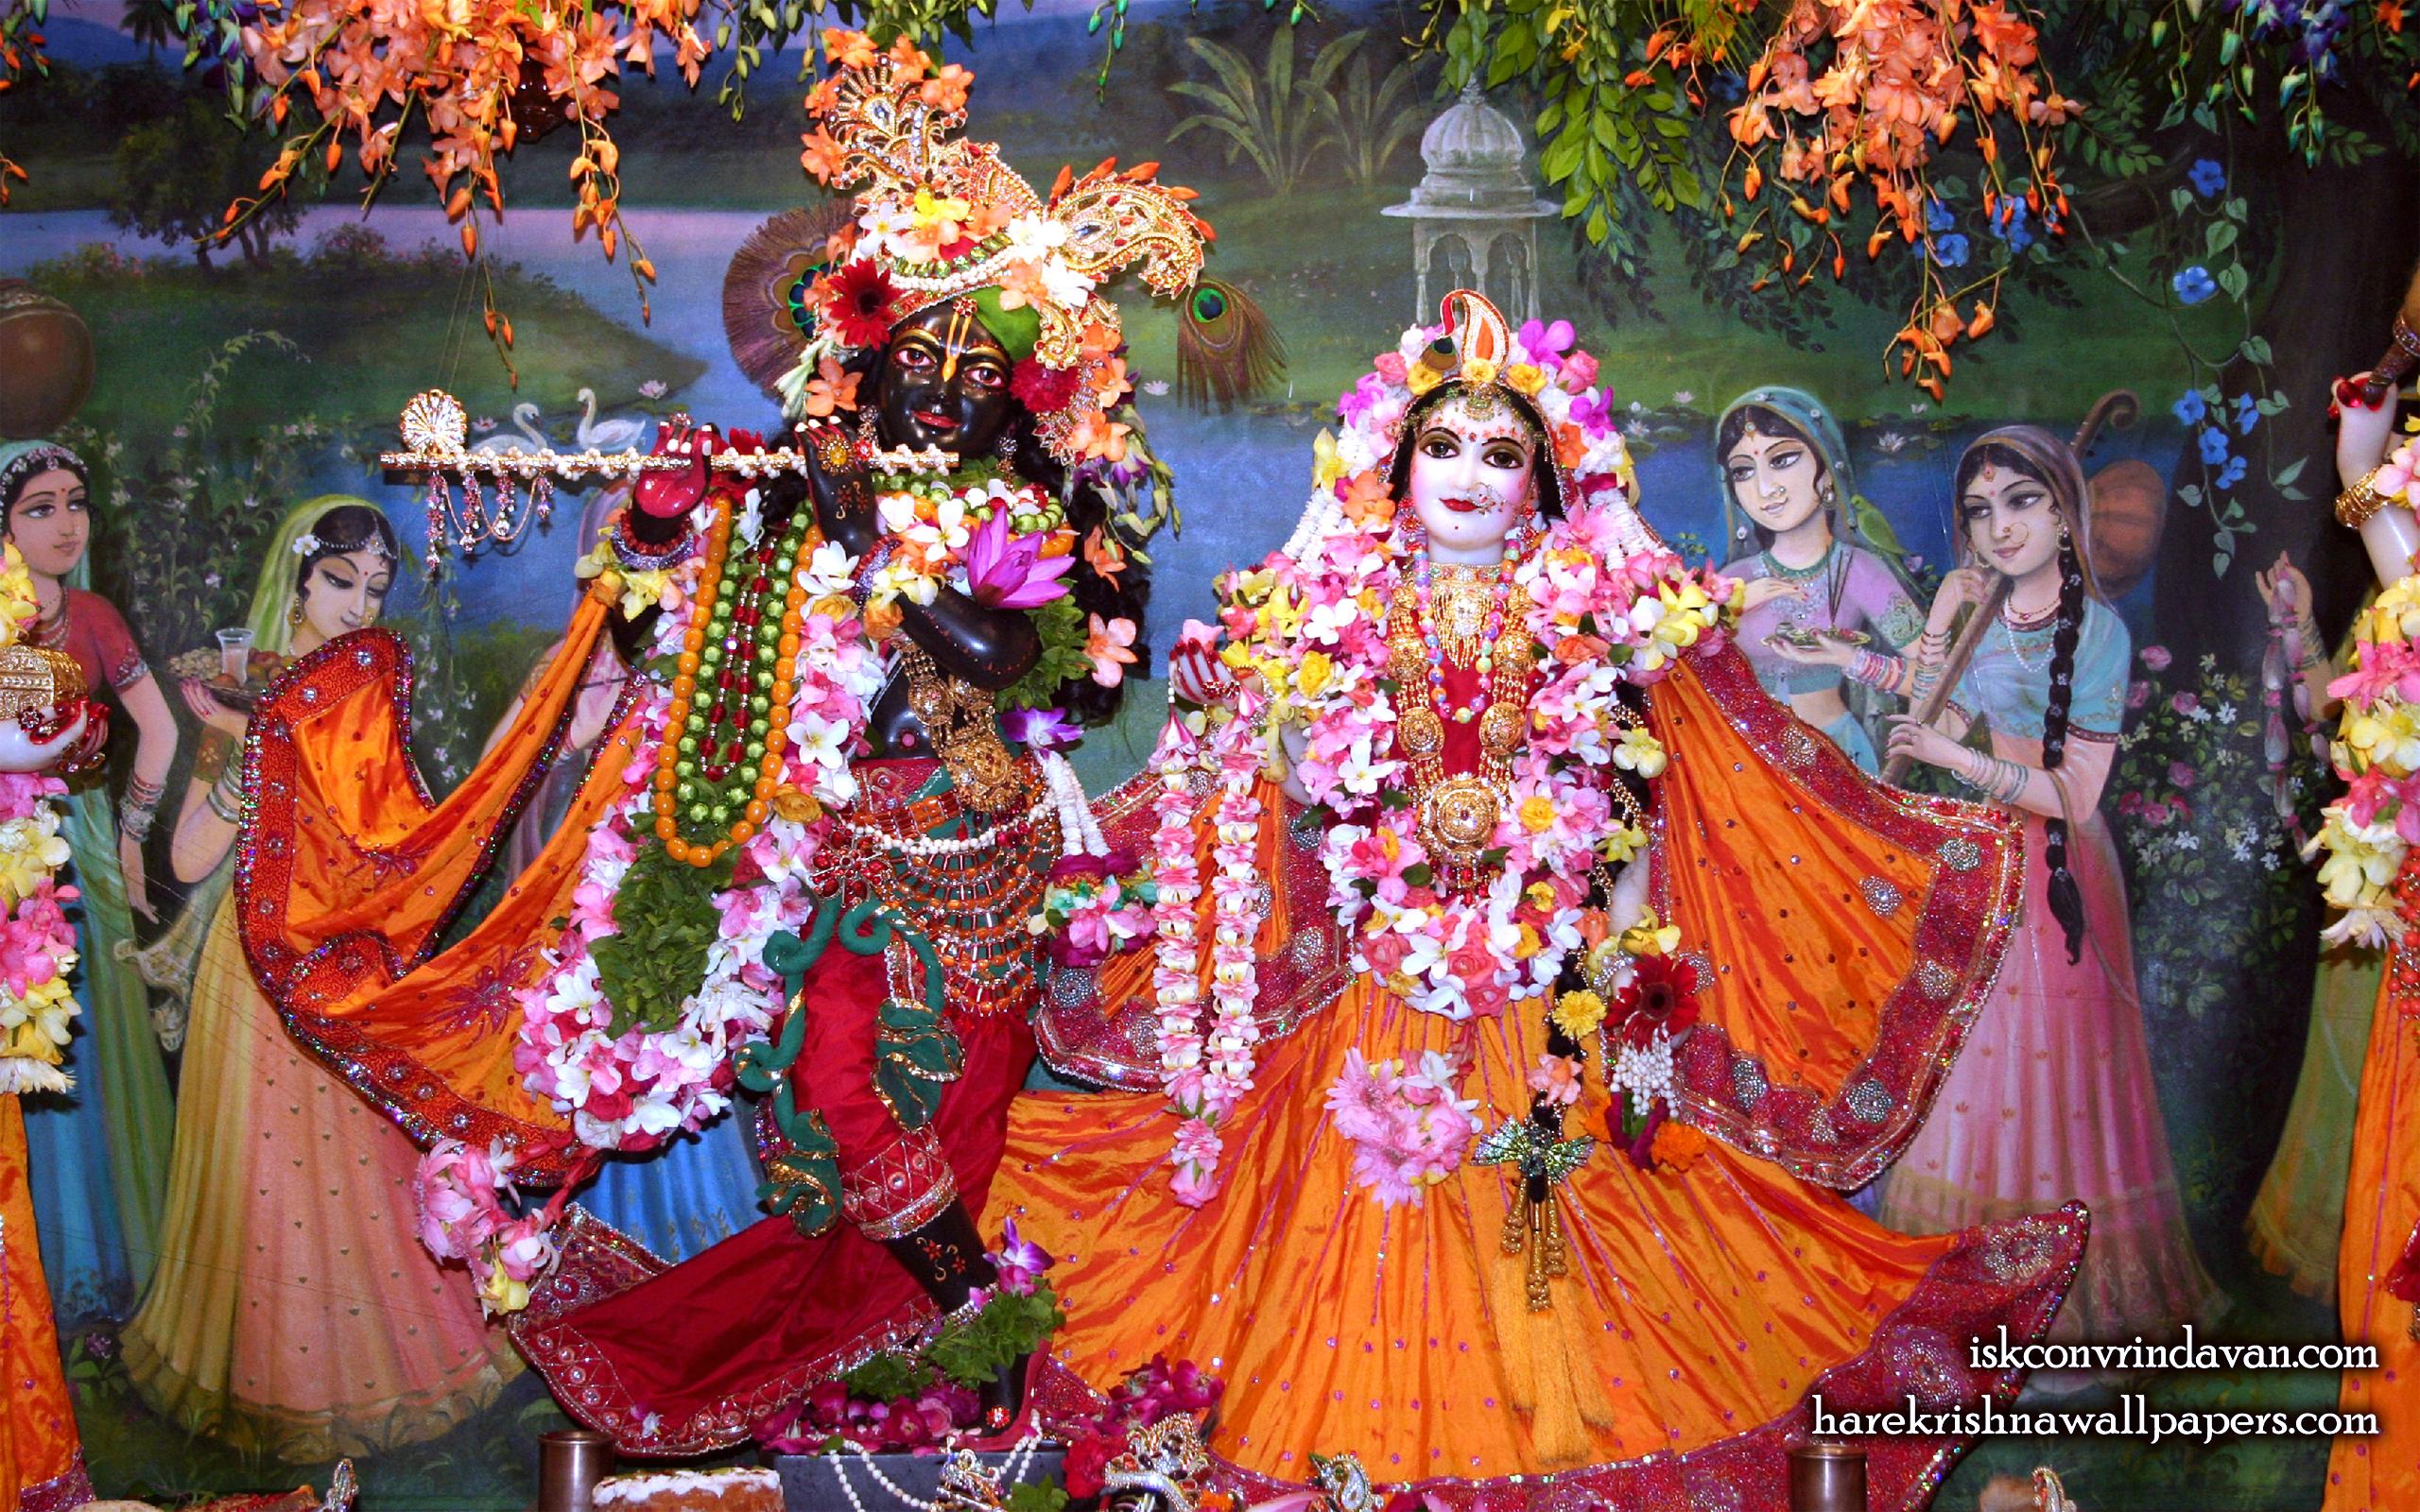 Sri Sri Radha Shyamsundar Wallpaper (017) Size 2560x1600 Download